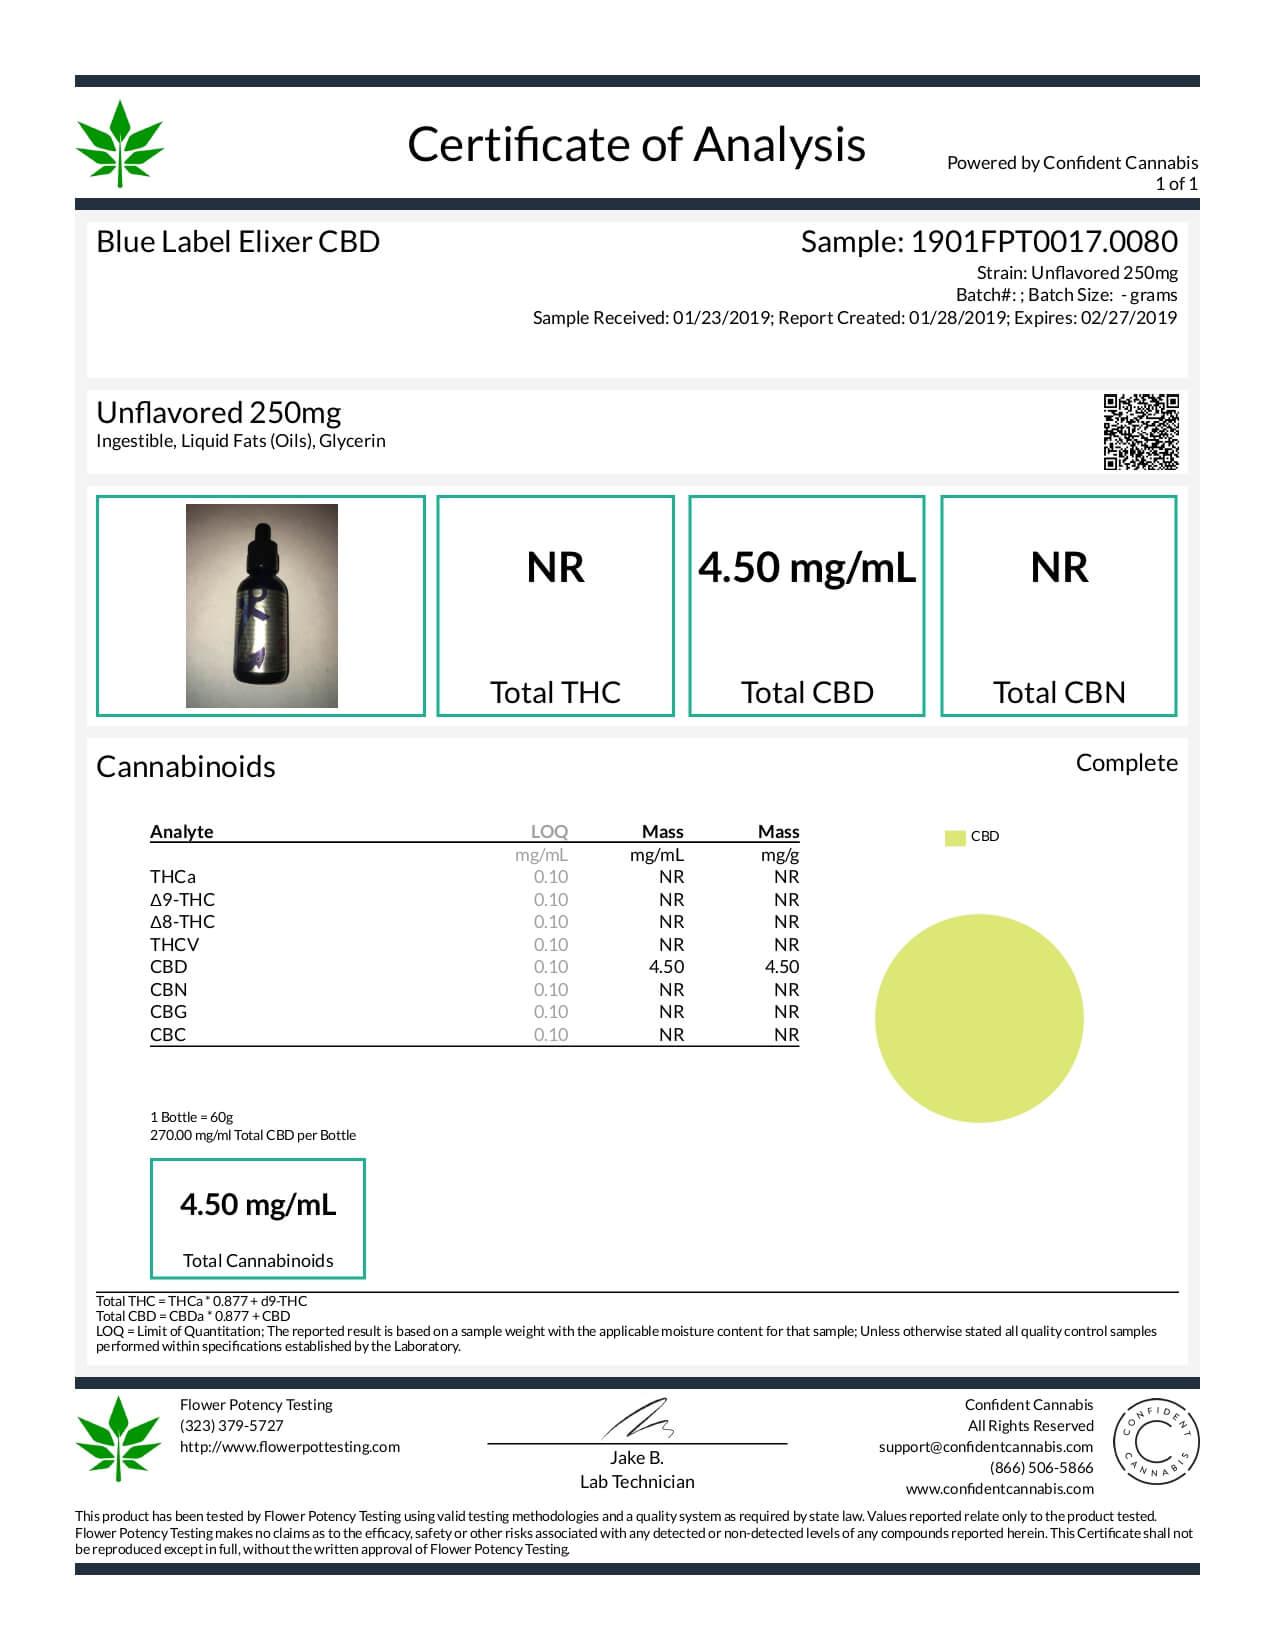 Blue Label CBD Vape Juice Unflavored Additive 250mg Lab Report